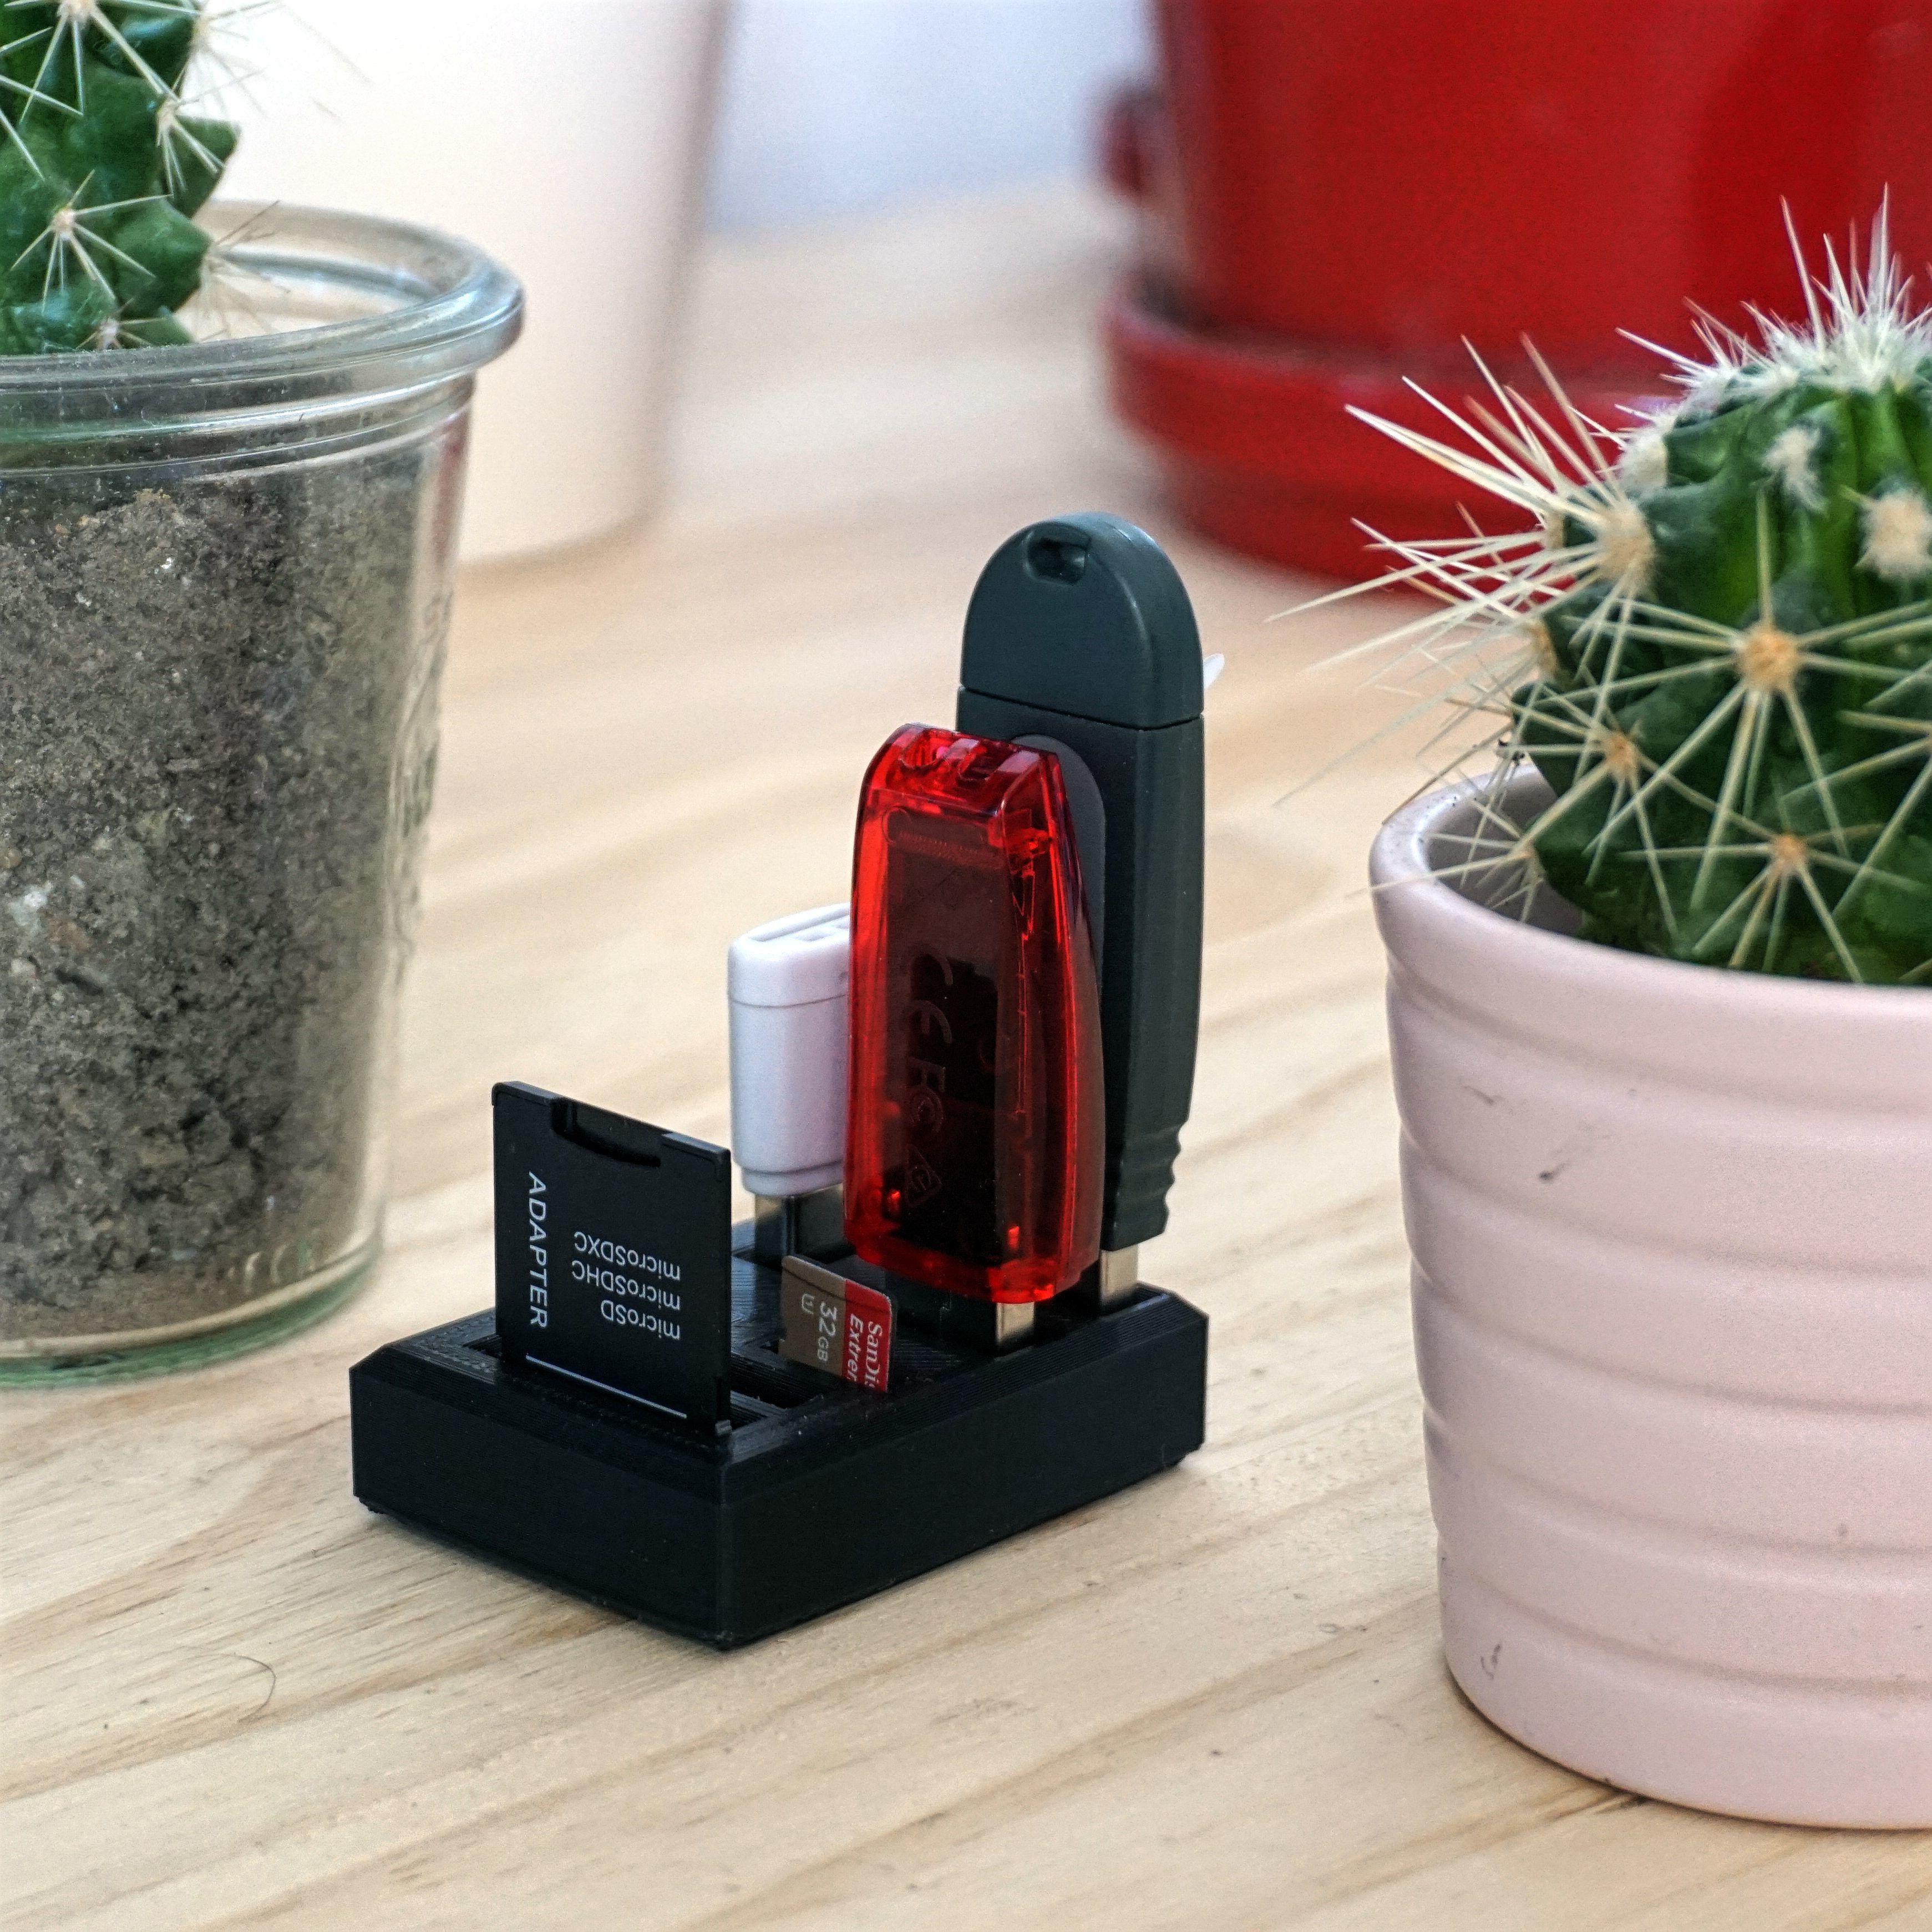 Modéle 1.jpg Download free STL file MINI HOLDER - USB • 3D printing model, Bobypeche